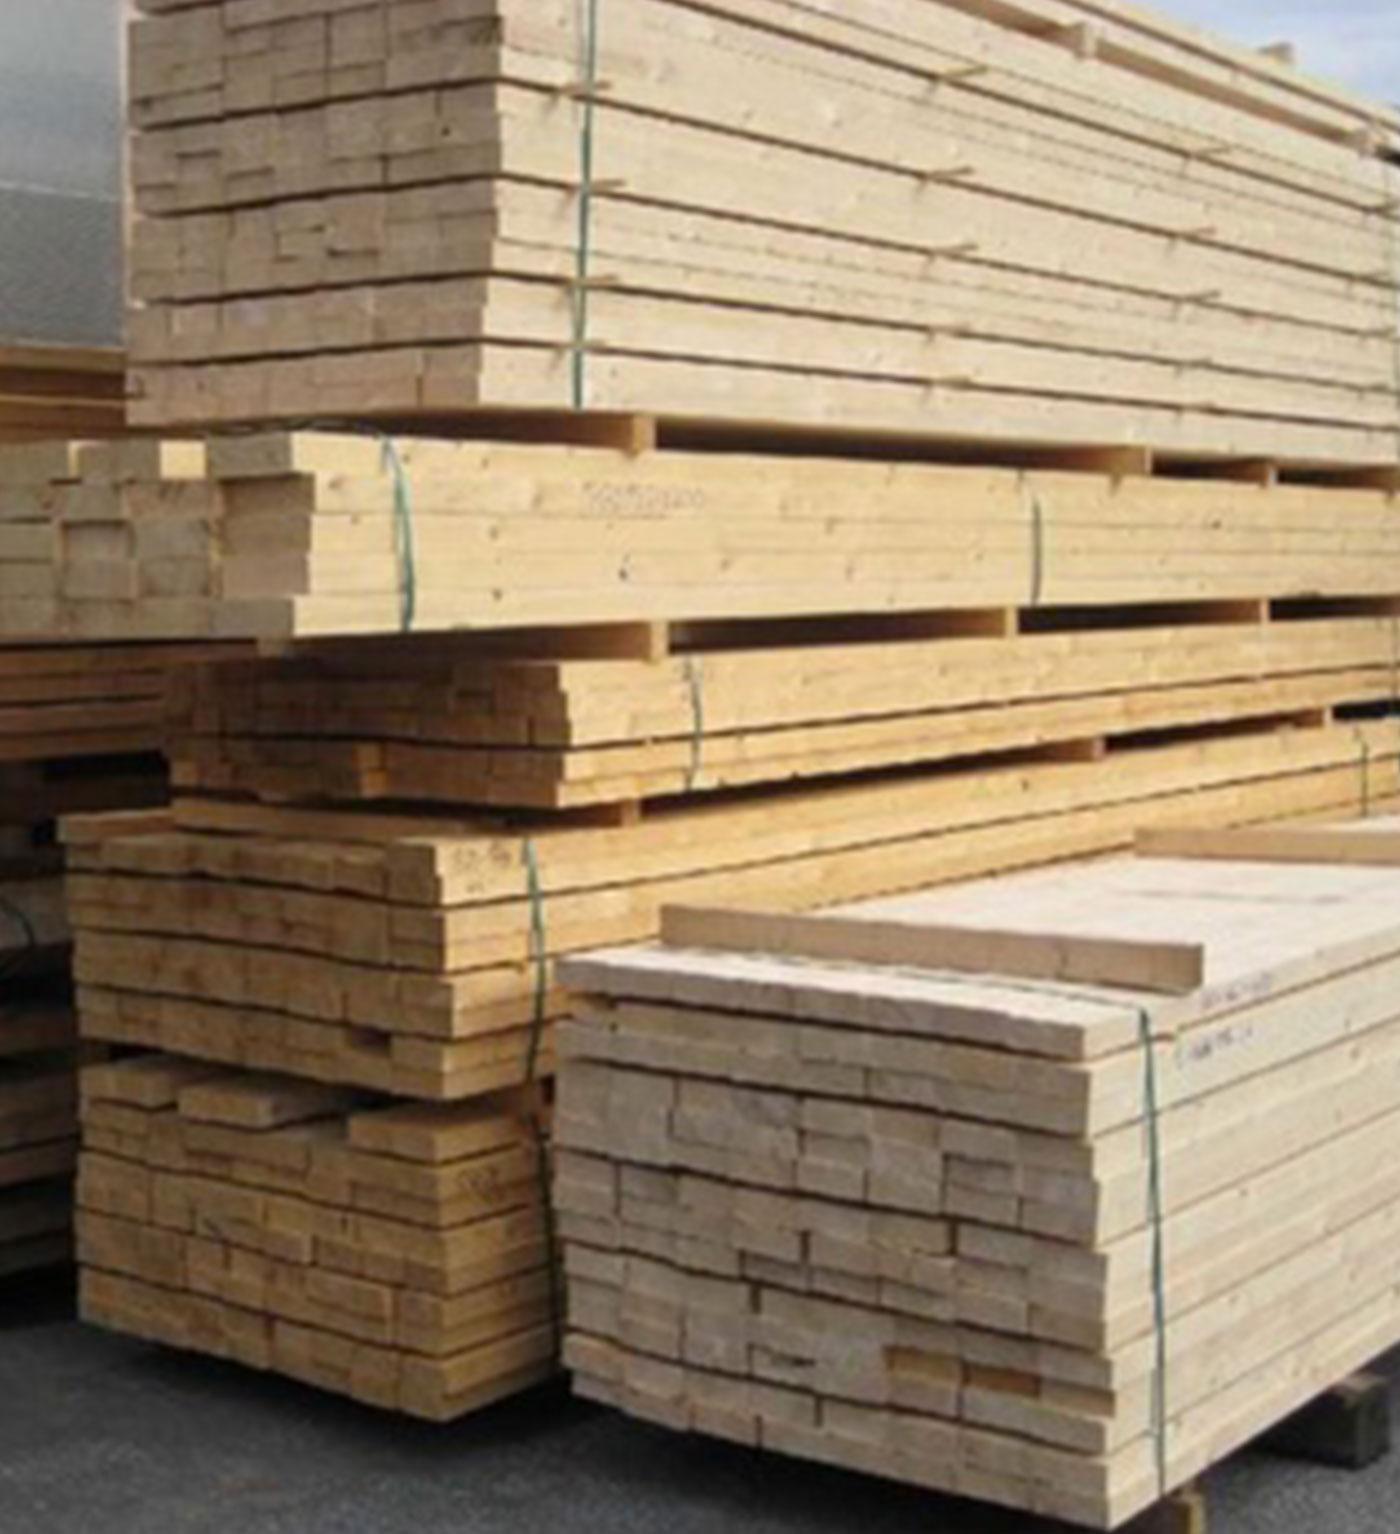 spruce-lumber-consistent